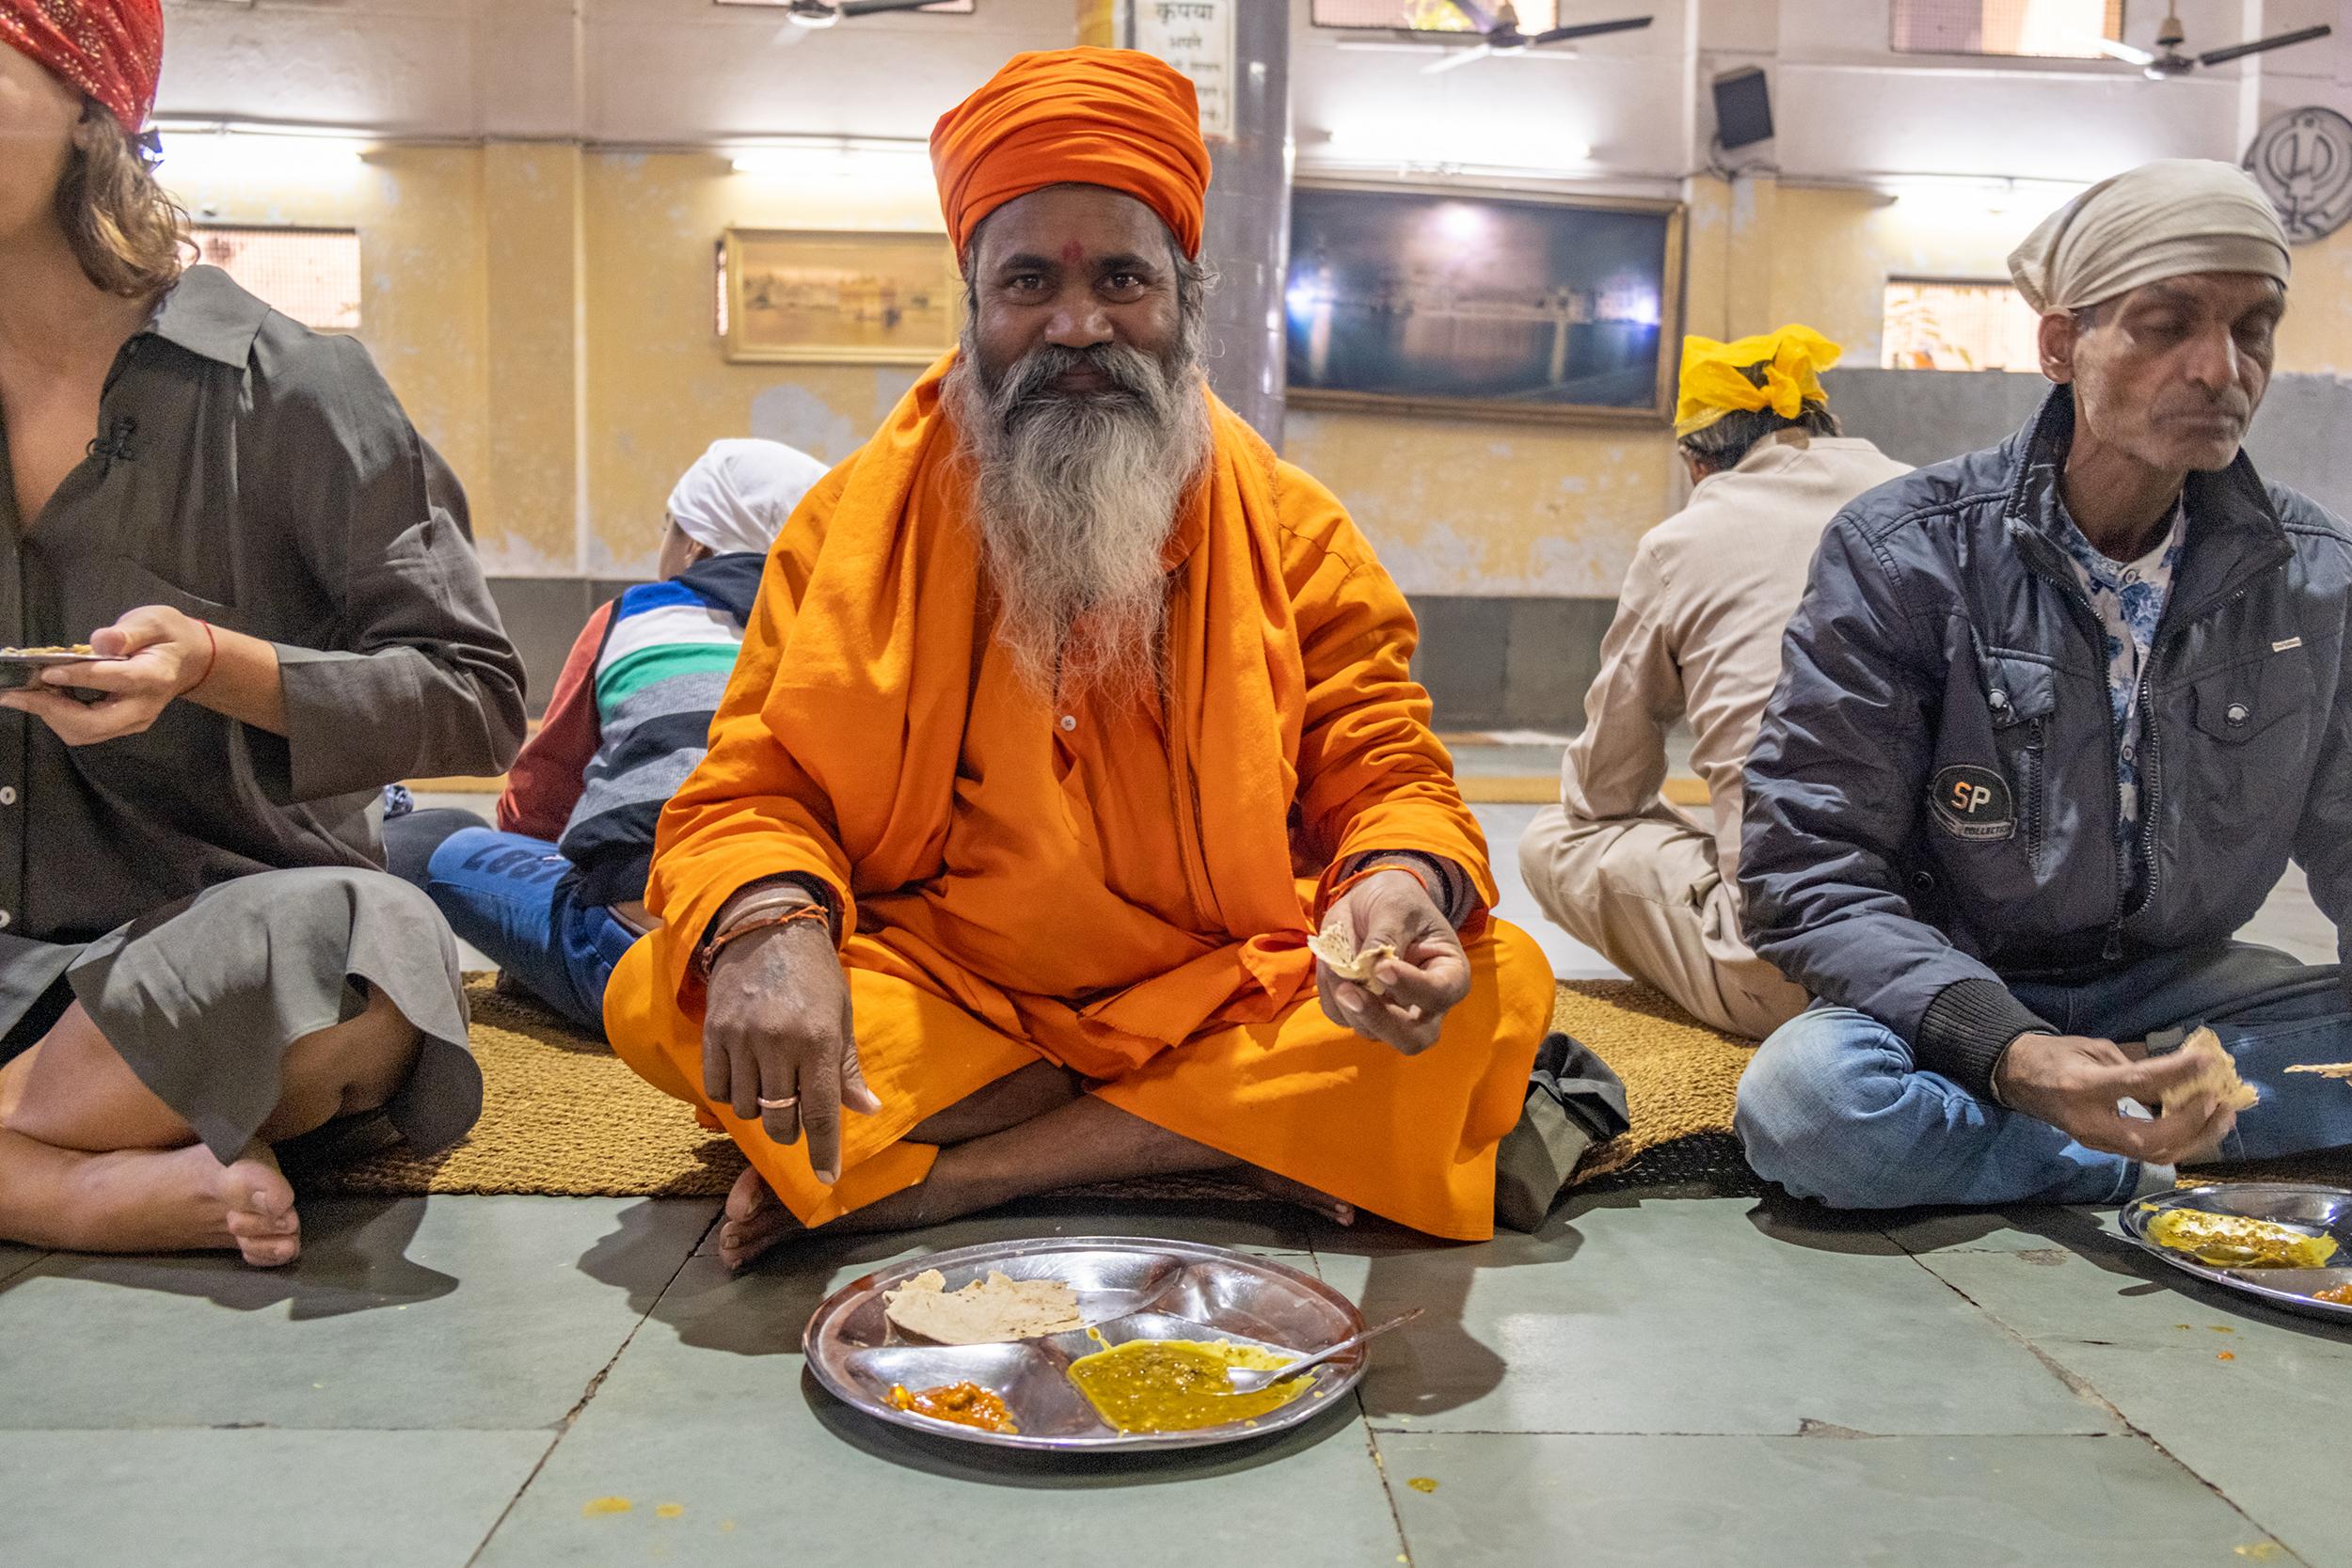 https://bubo.sk/uploads/galleries/4917/india-gurudwara.jpg